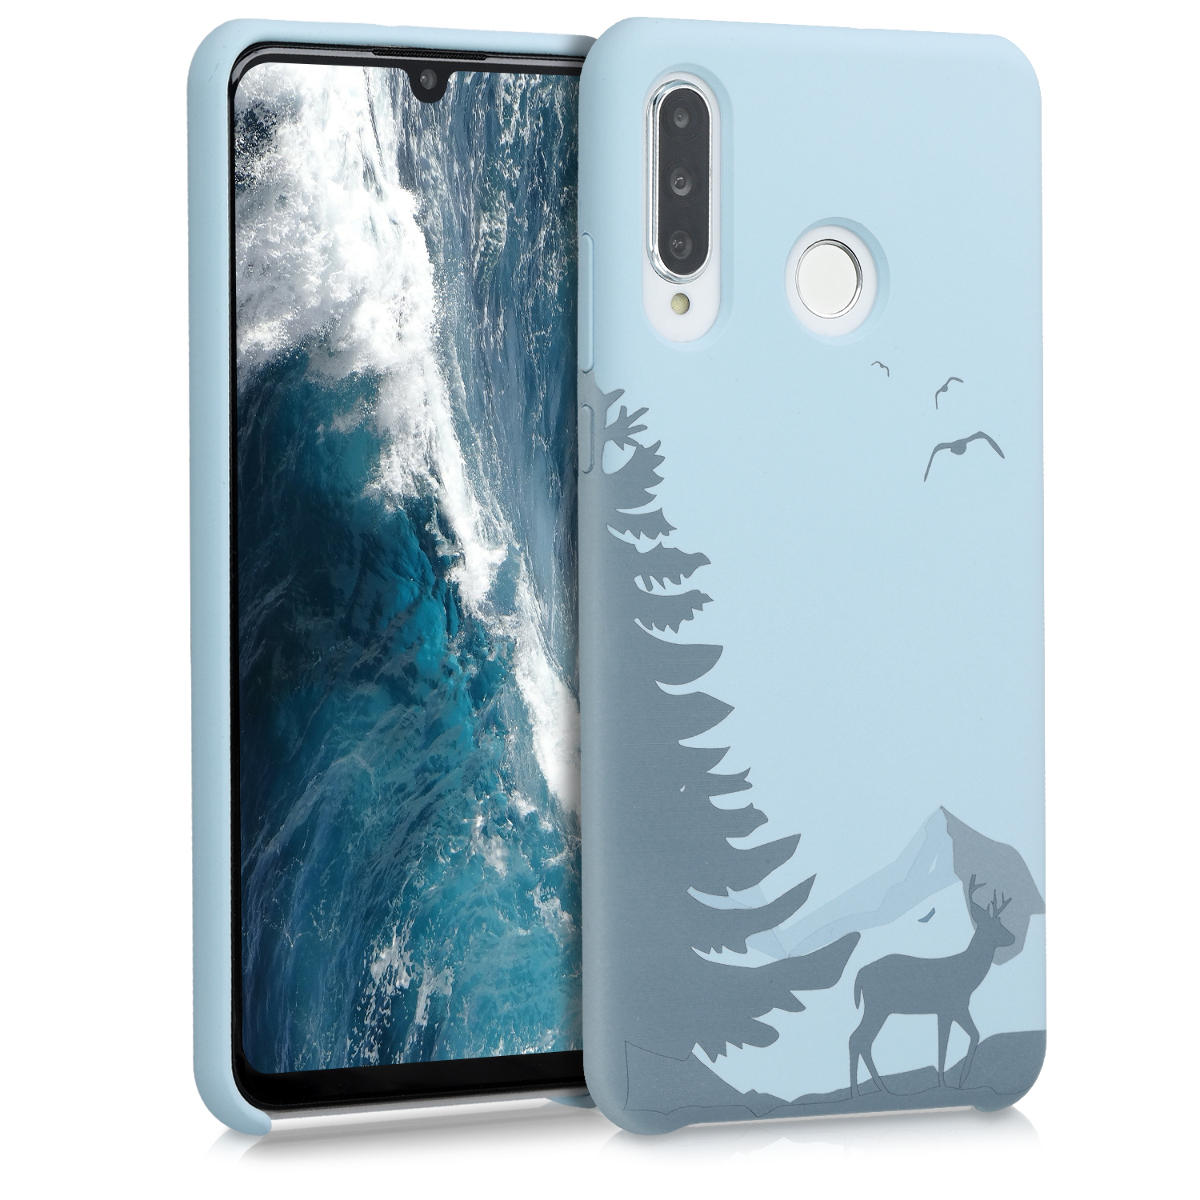 KW Θήκη Σιλικόνης Huawei P30 Lite - Laser Engraved Deer Light Blue (51167.04)